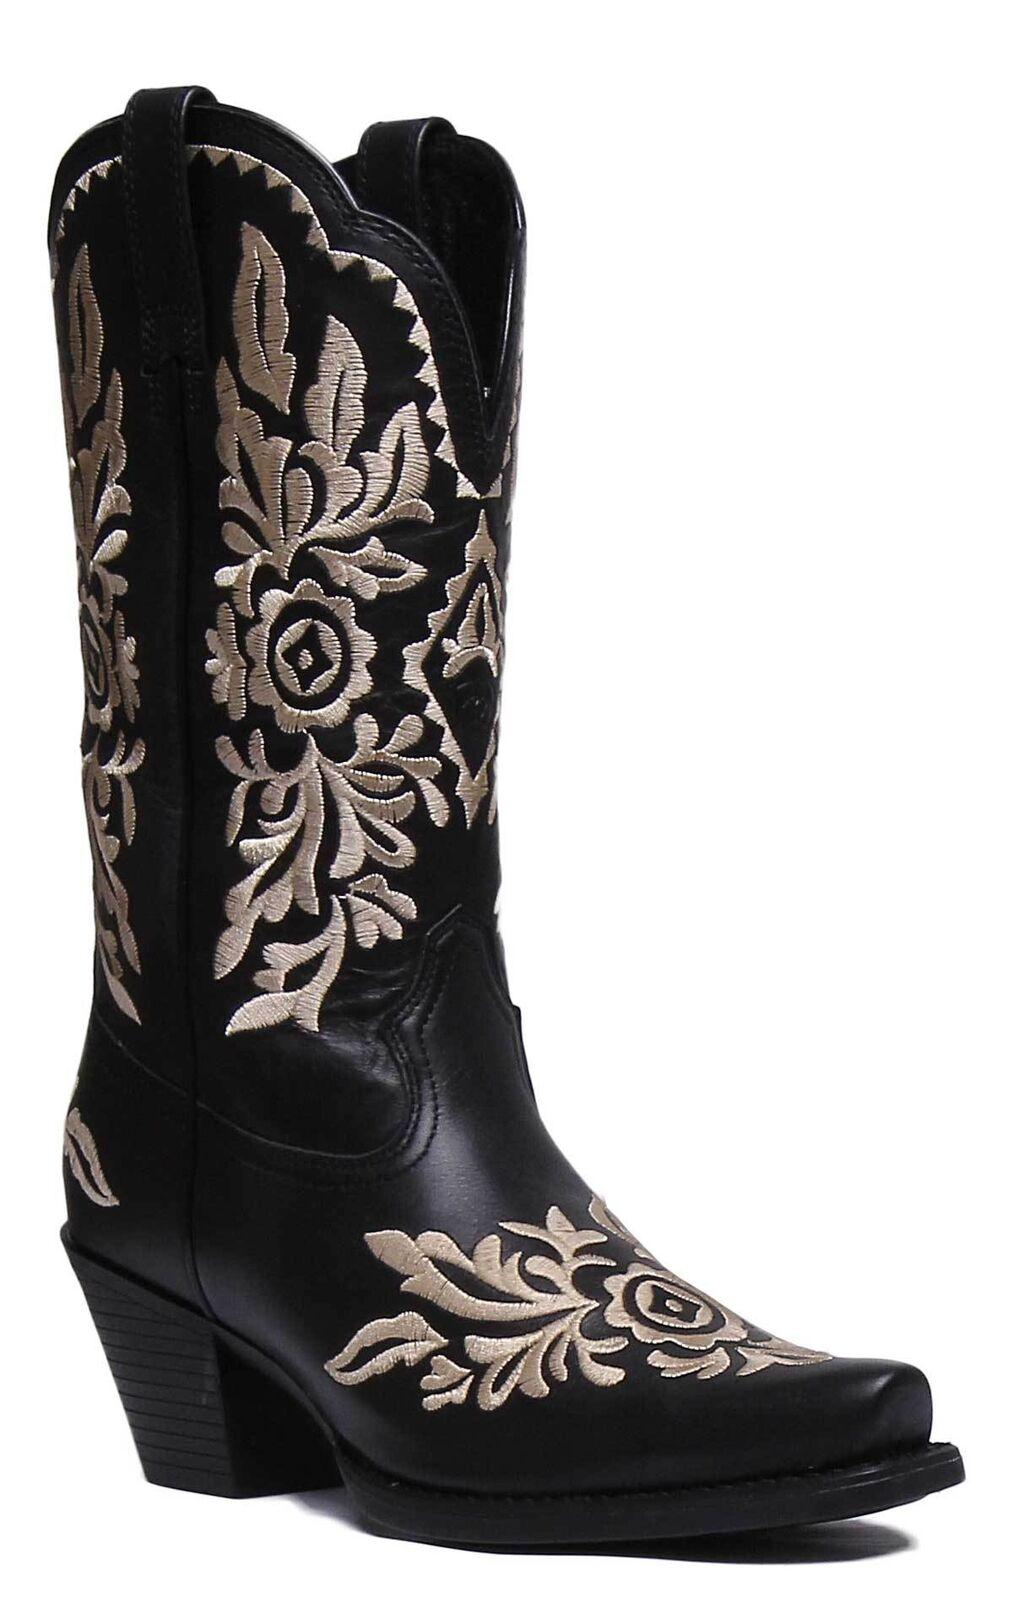 Ariat Harper Mujer de Cuero Negro botas botas Negro occidental Limousin tamaño de Reino Unido 3 - 8 0fa125